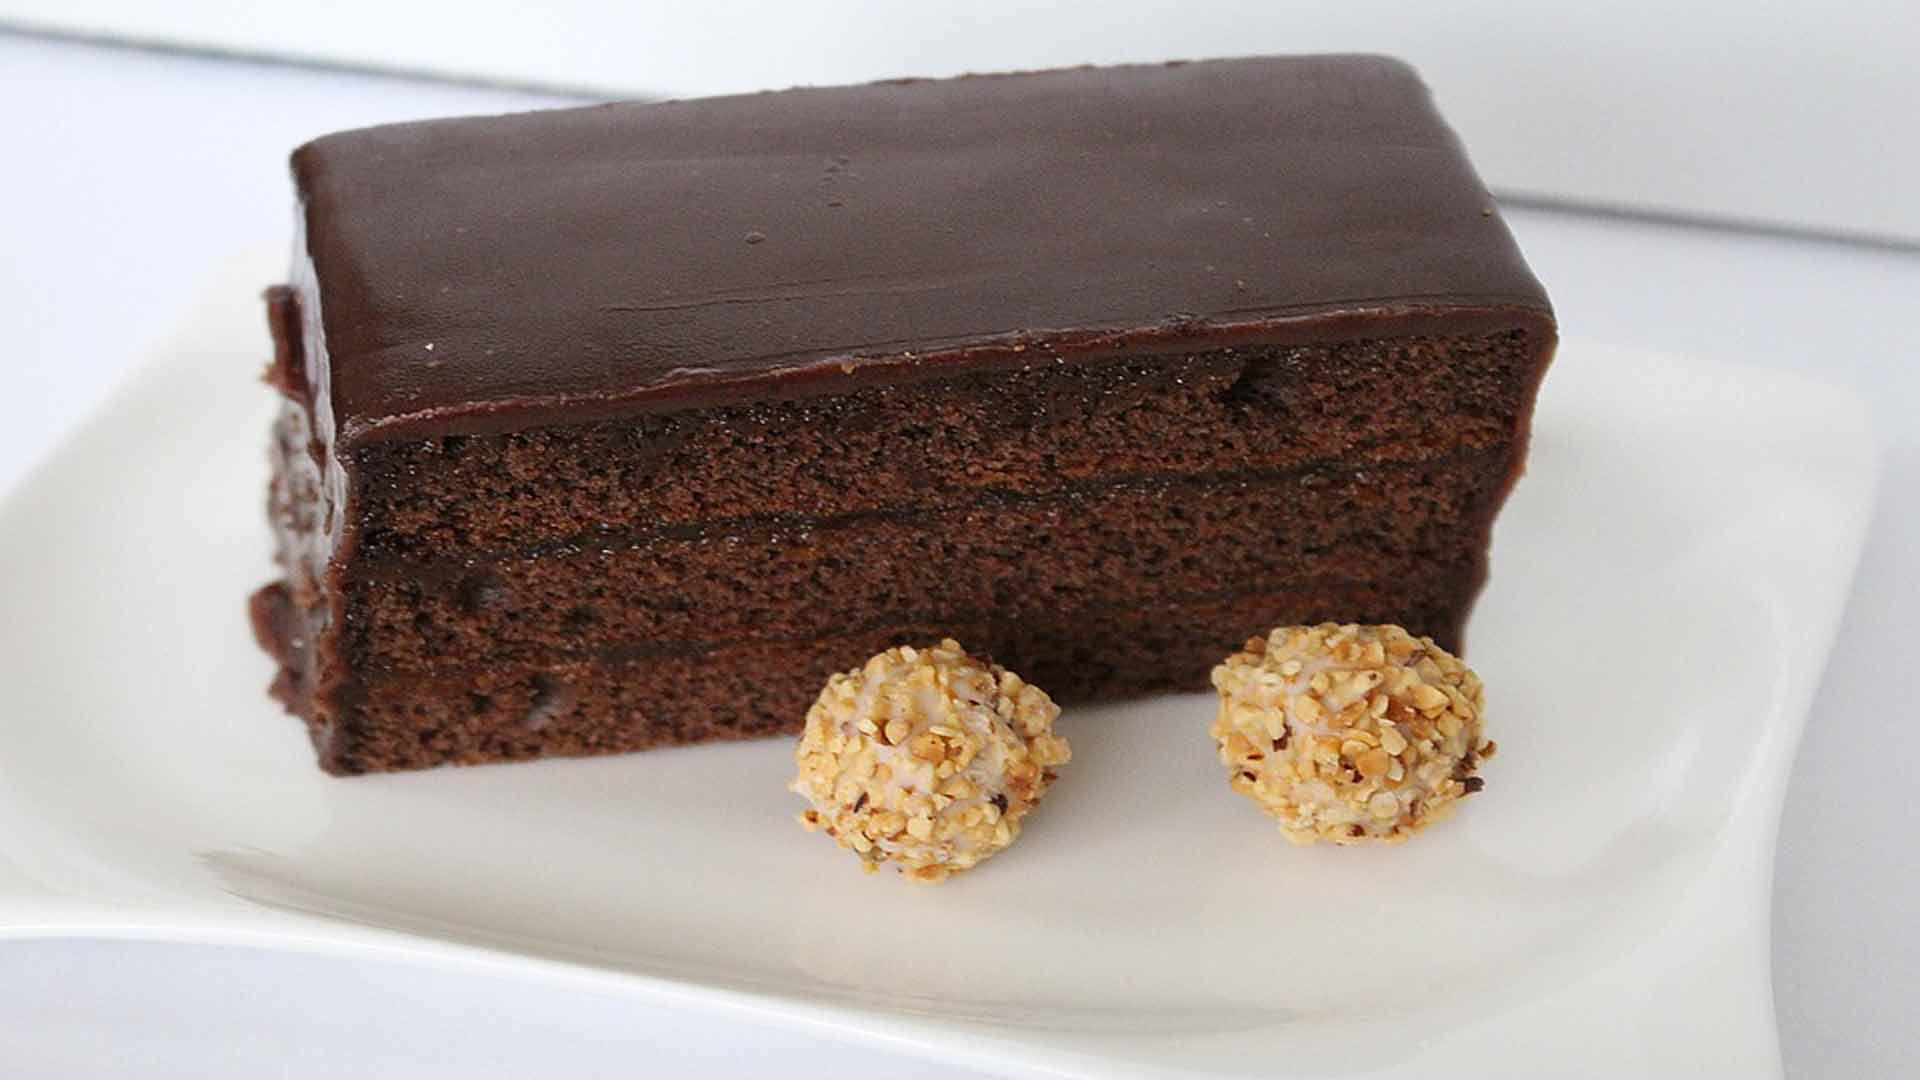 10-saludables-pretextos-para-tomar-chocolate-1920